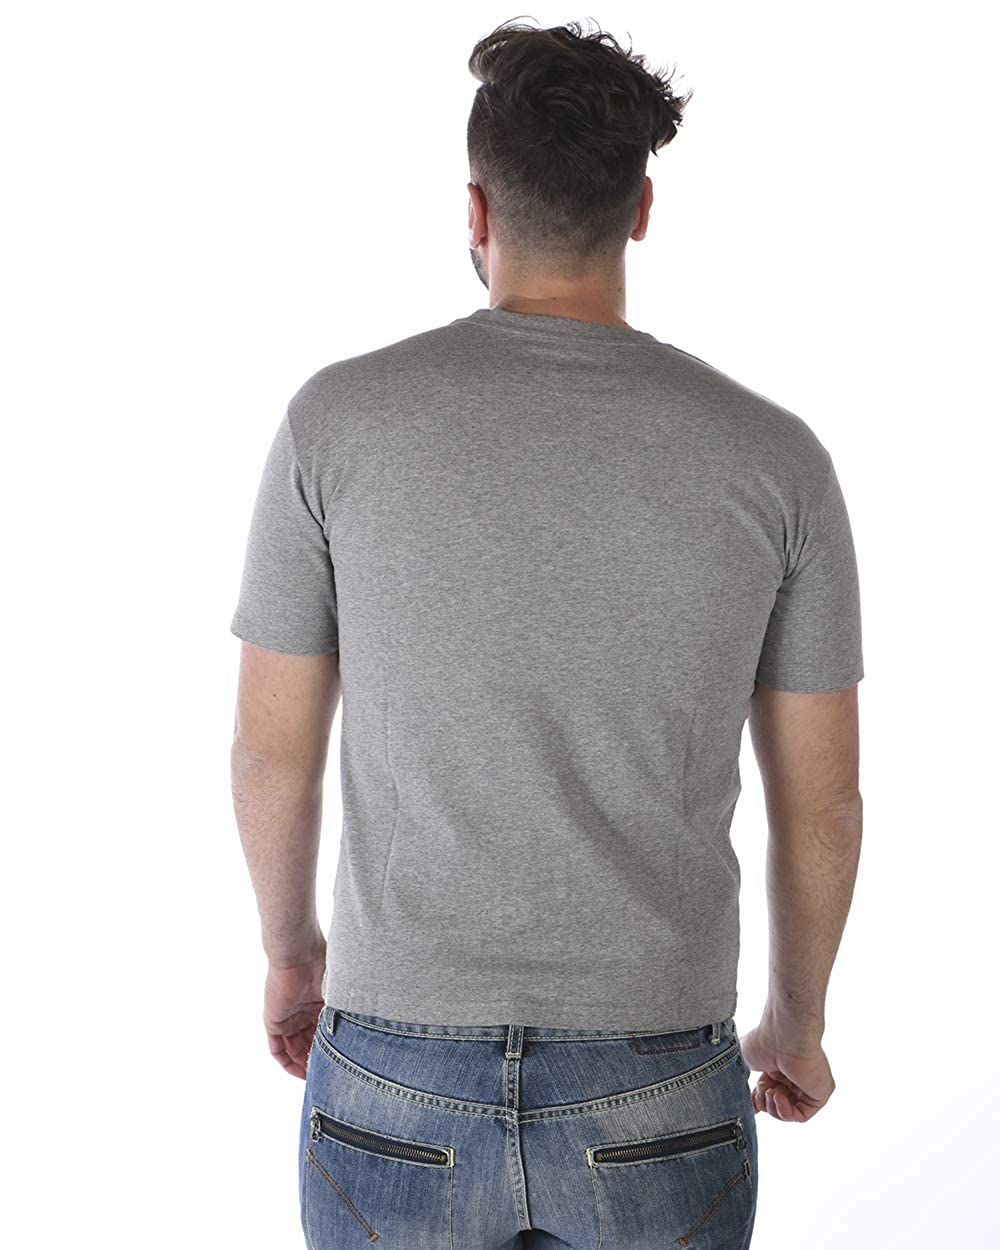 5b204b30 Amazon.com: Kenzo Men's Leopard Tiger Grey Cotton T-Shirt: Clothing